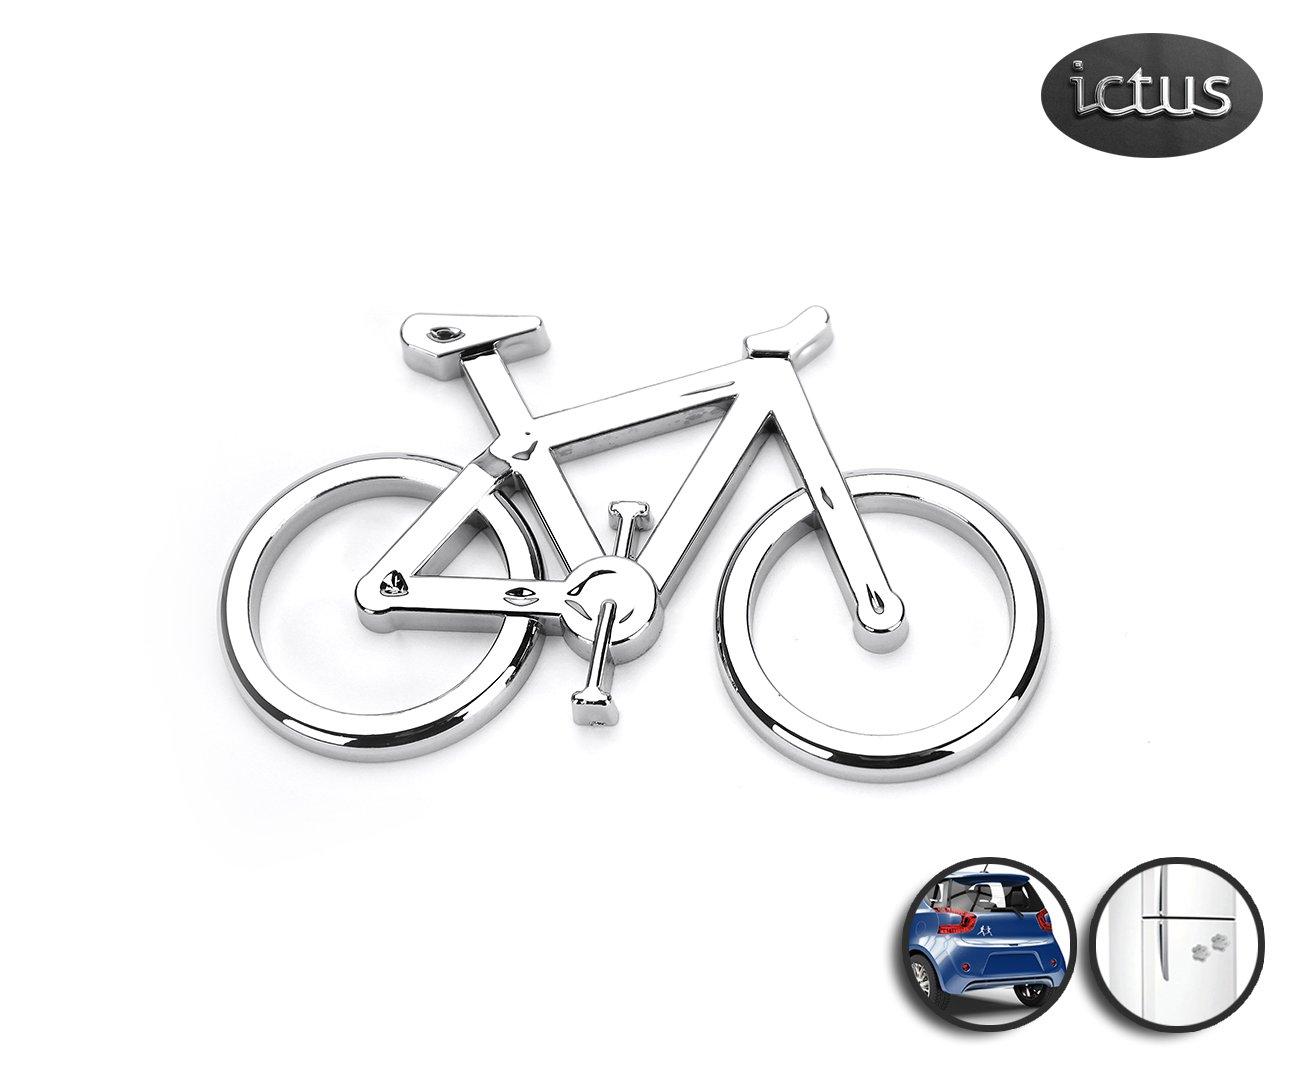 Emblema Bike - Ictus